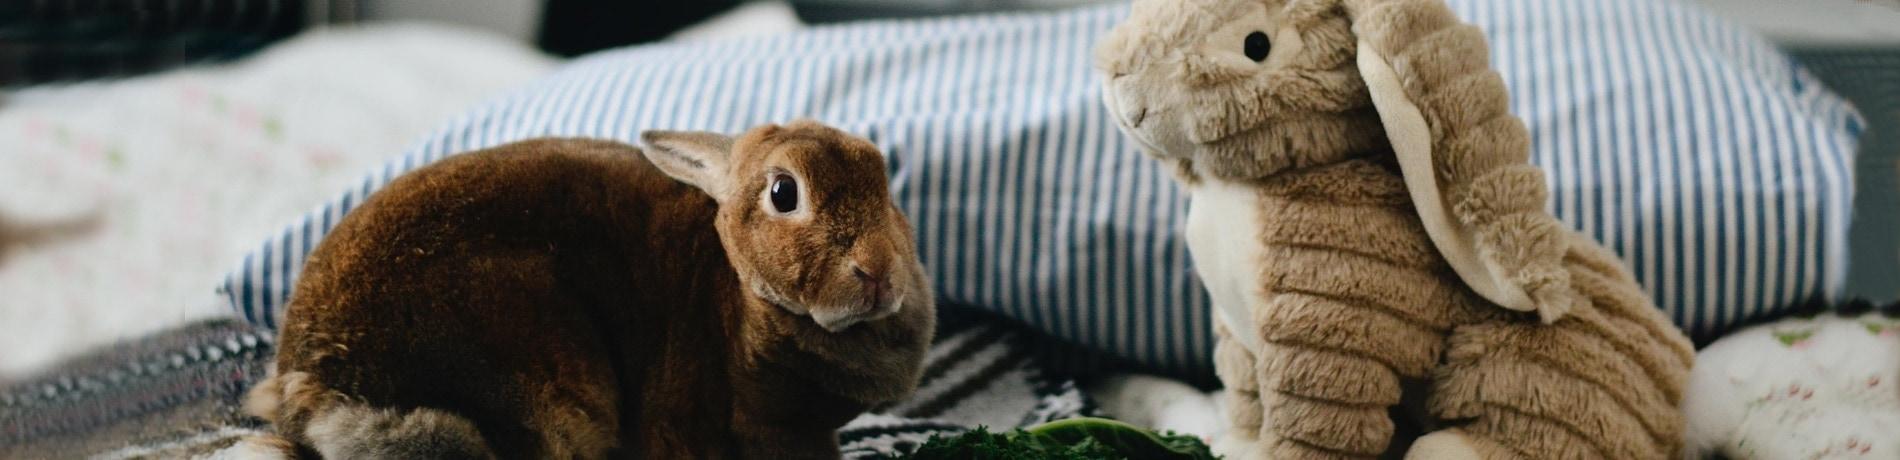 konijnen koppelen